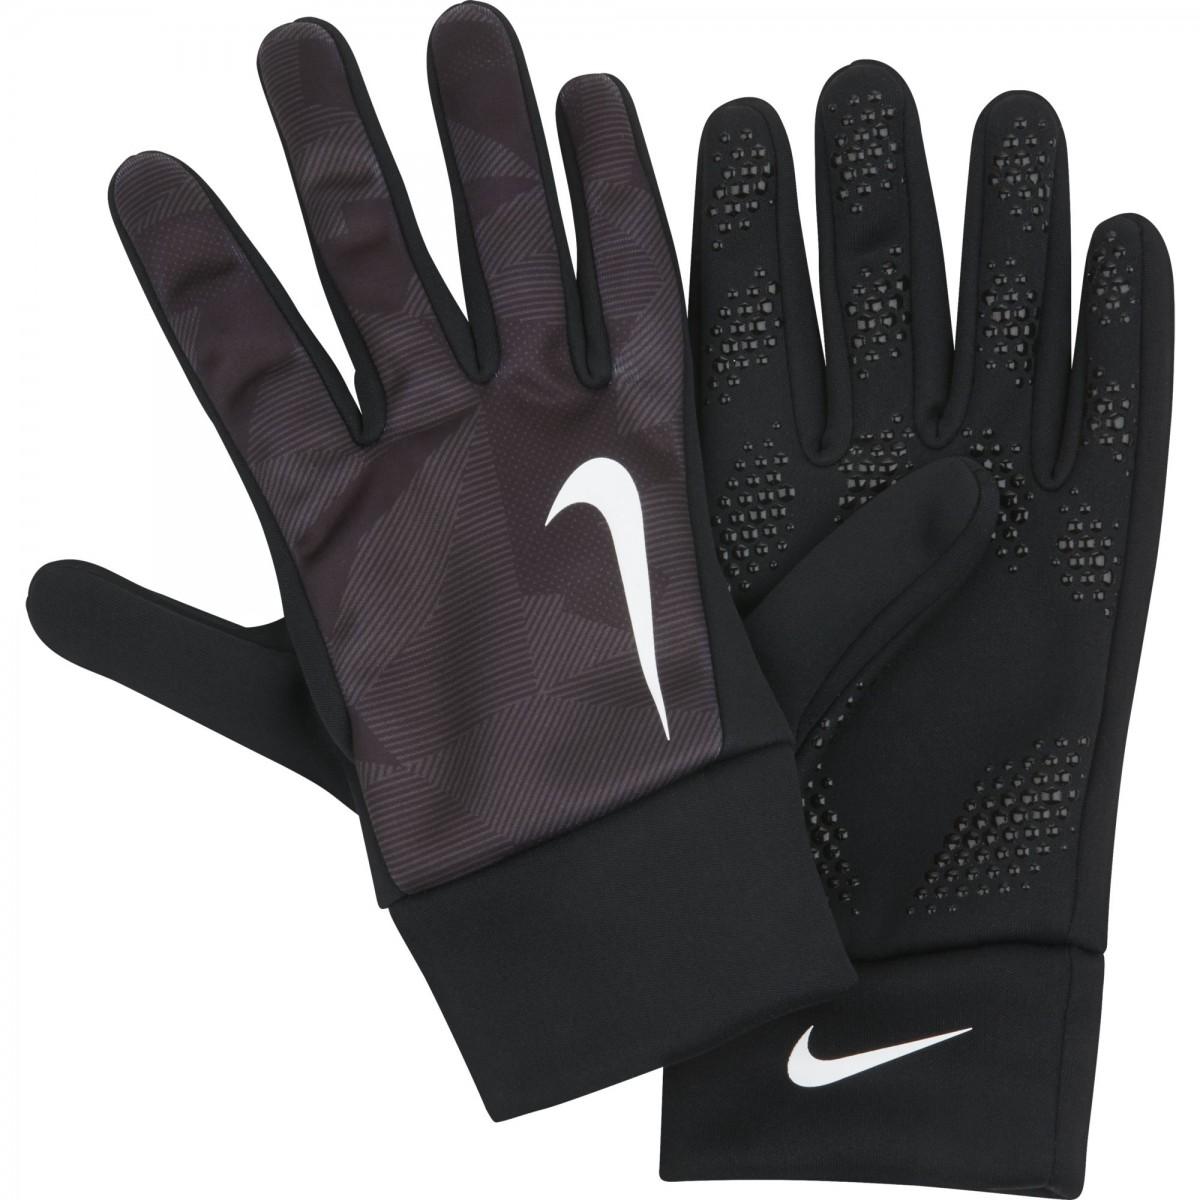 Nike Hyperwarm Field Player Football